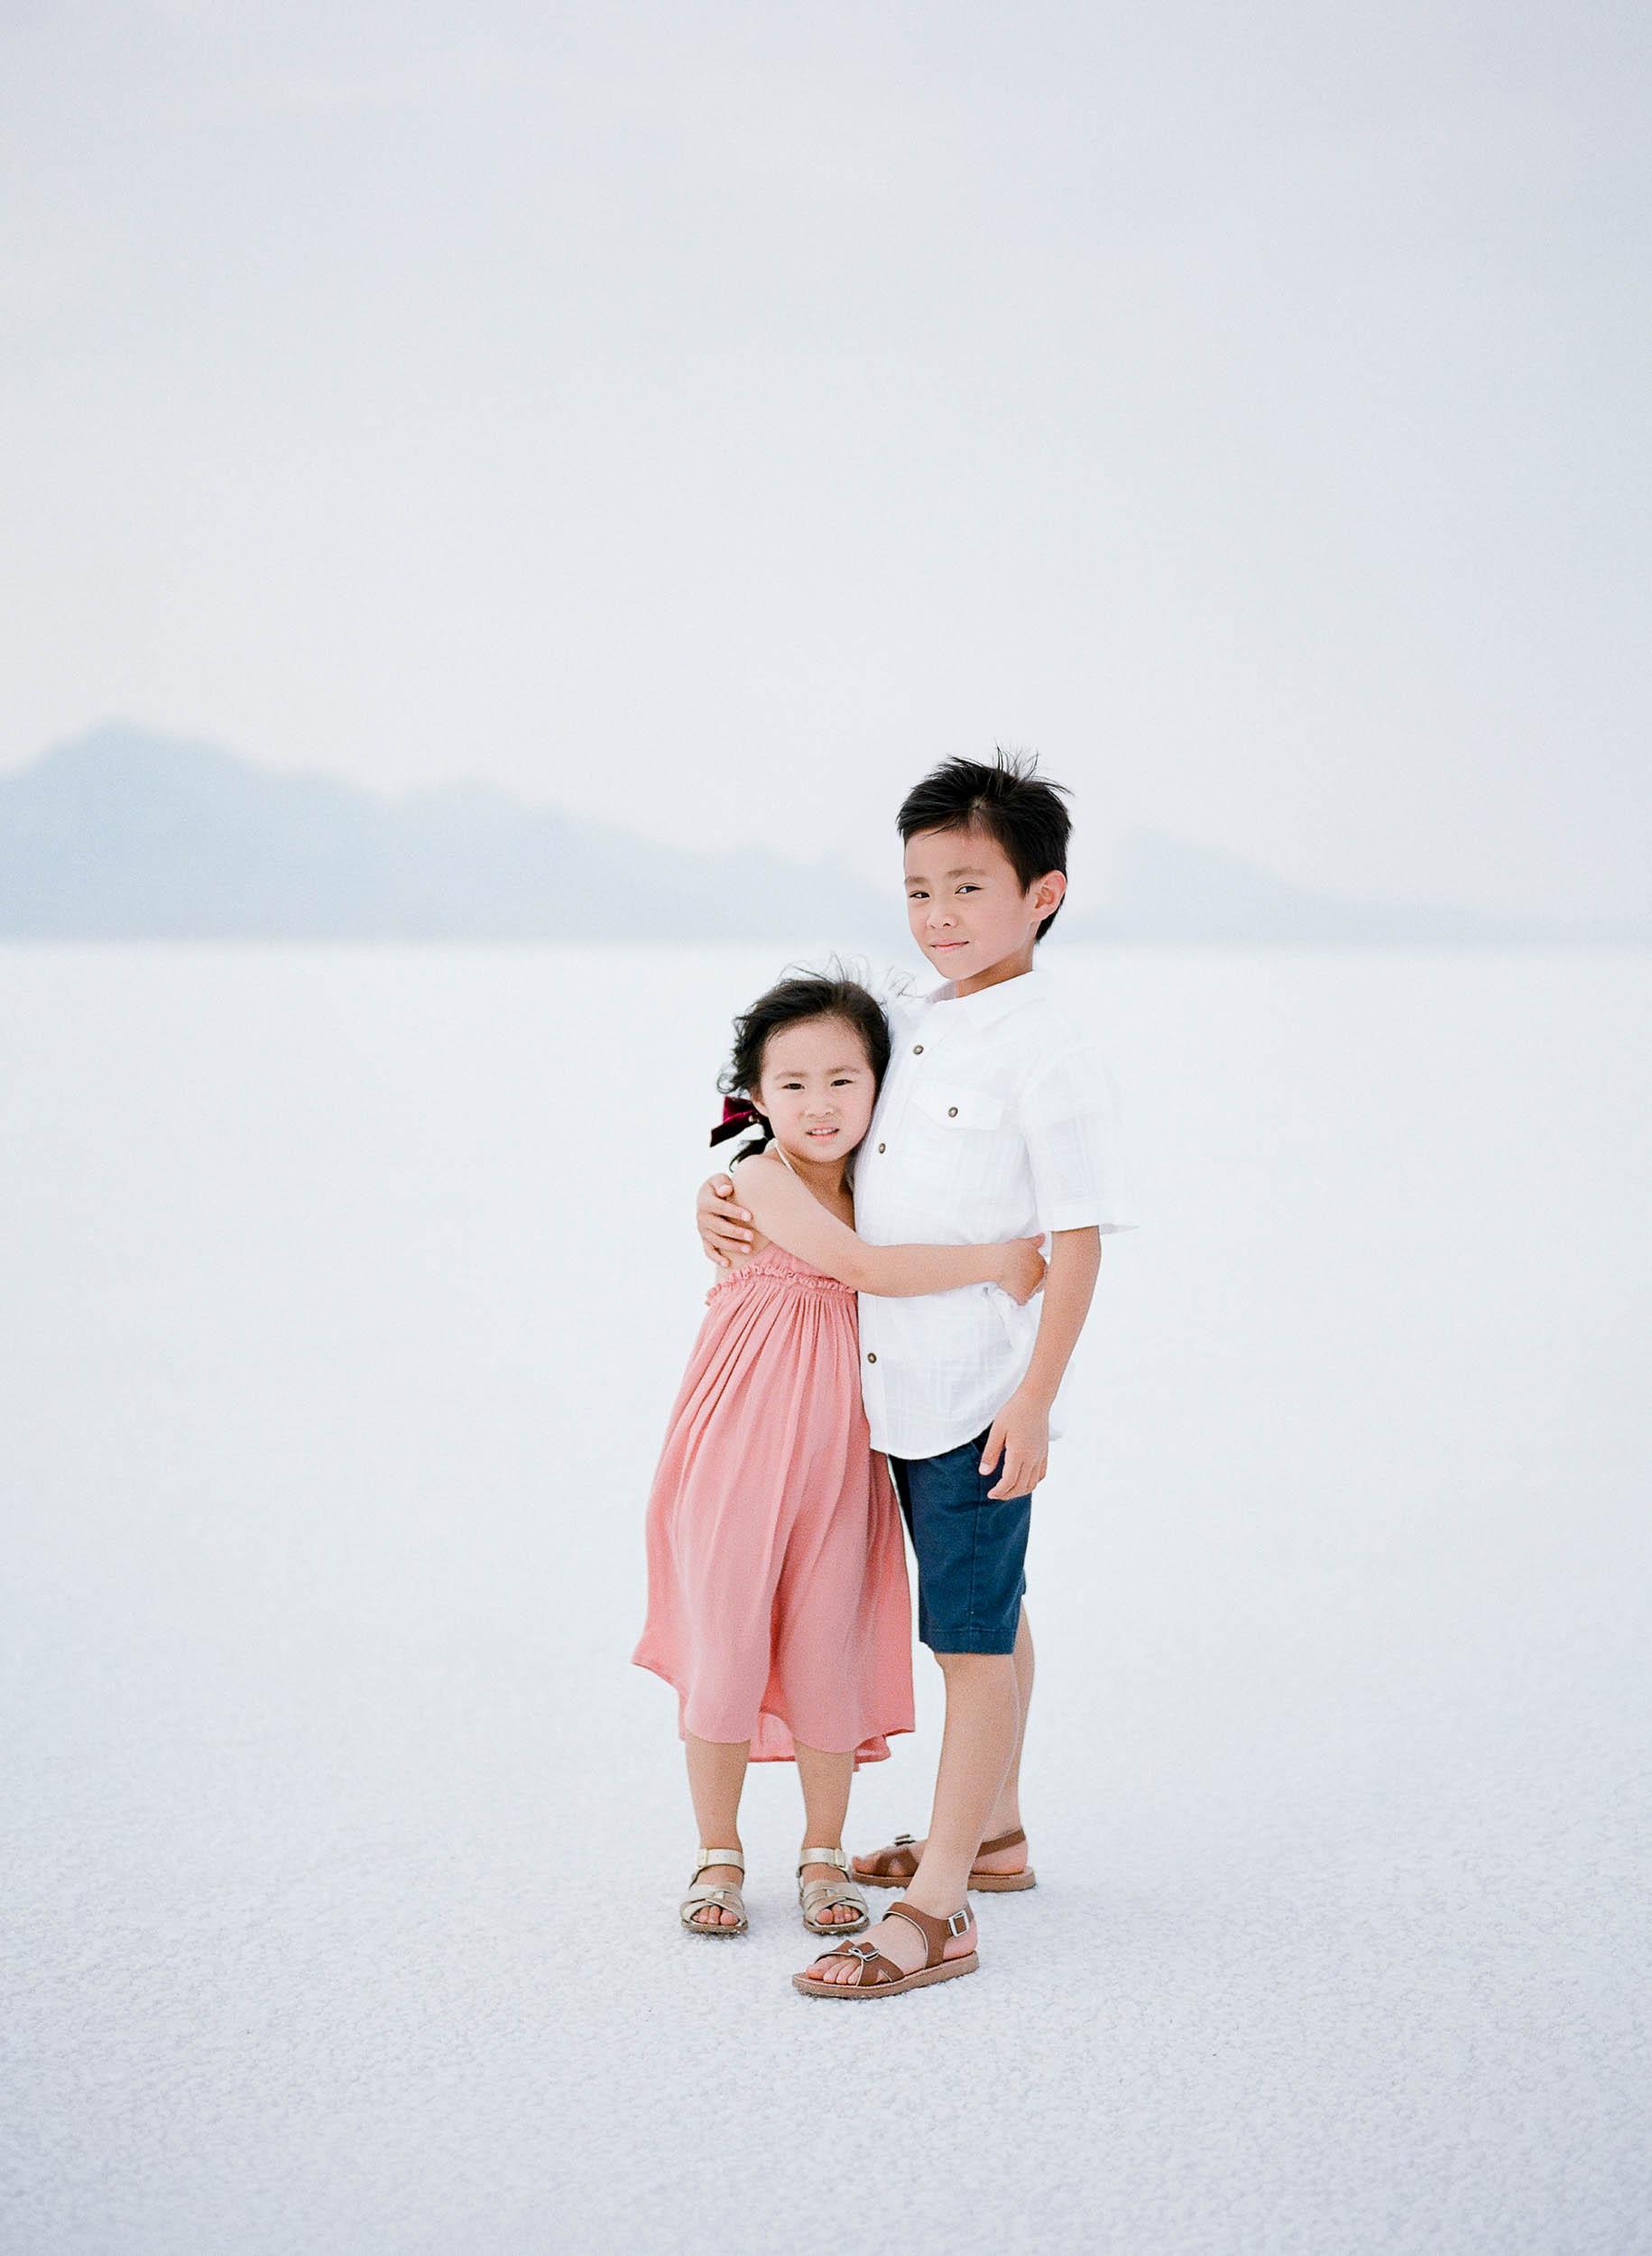 070918_Sandy A La Mode_Family_Utah Salt Flats_Buena Lane Photography_F400_58.jpg